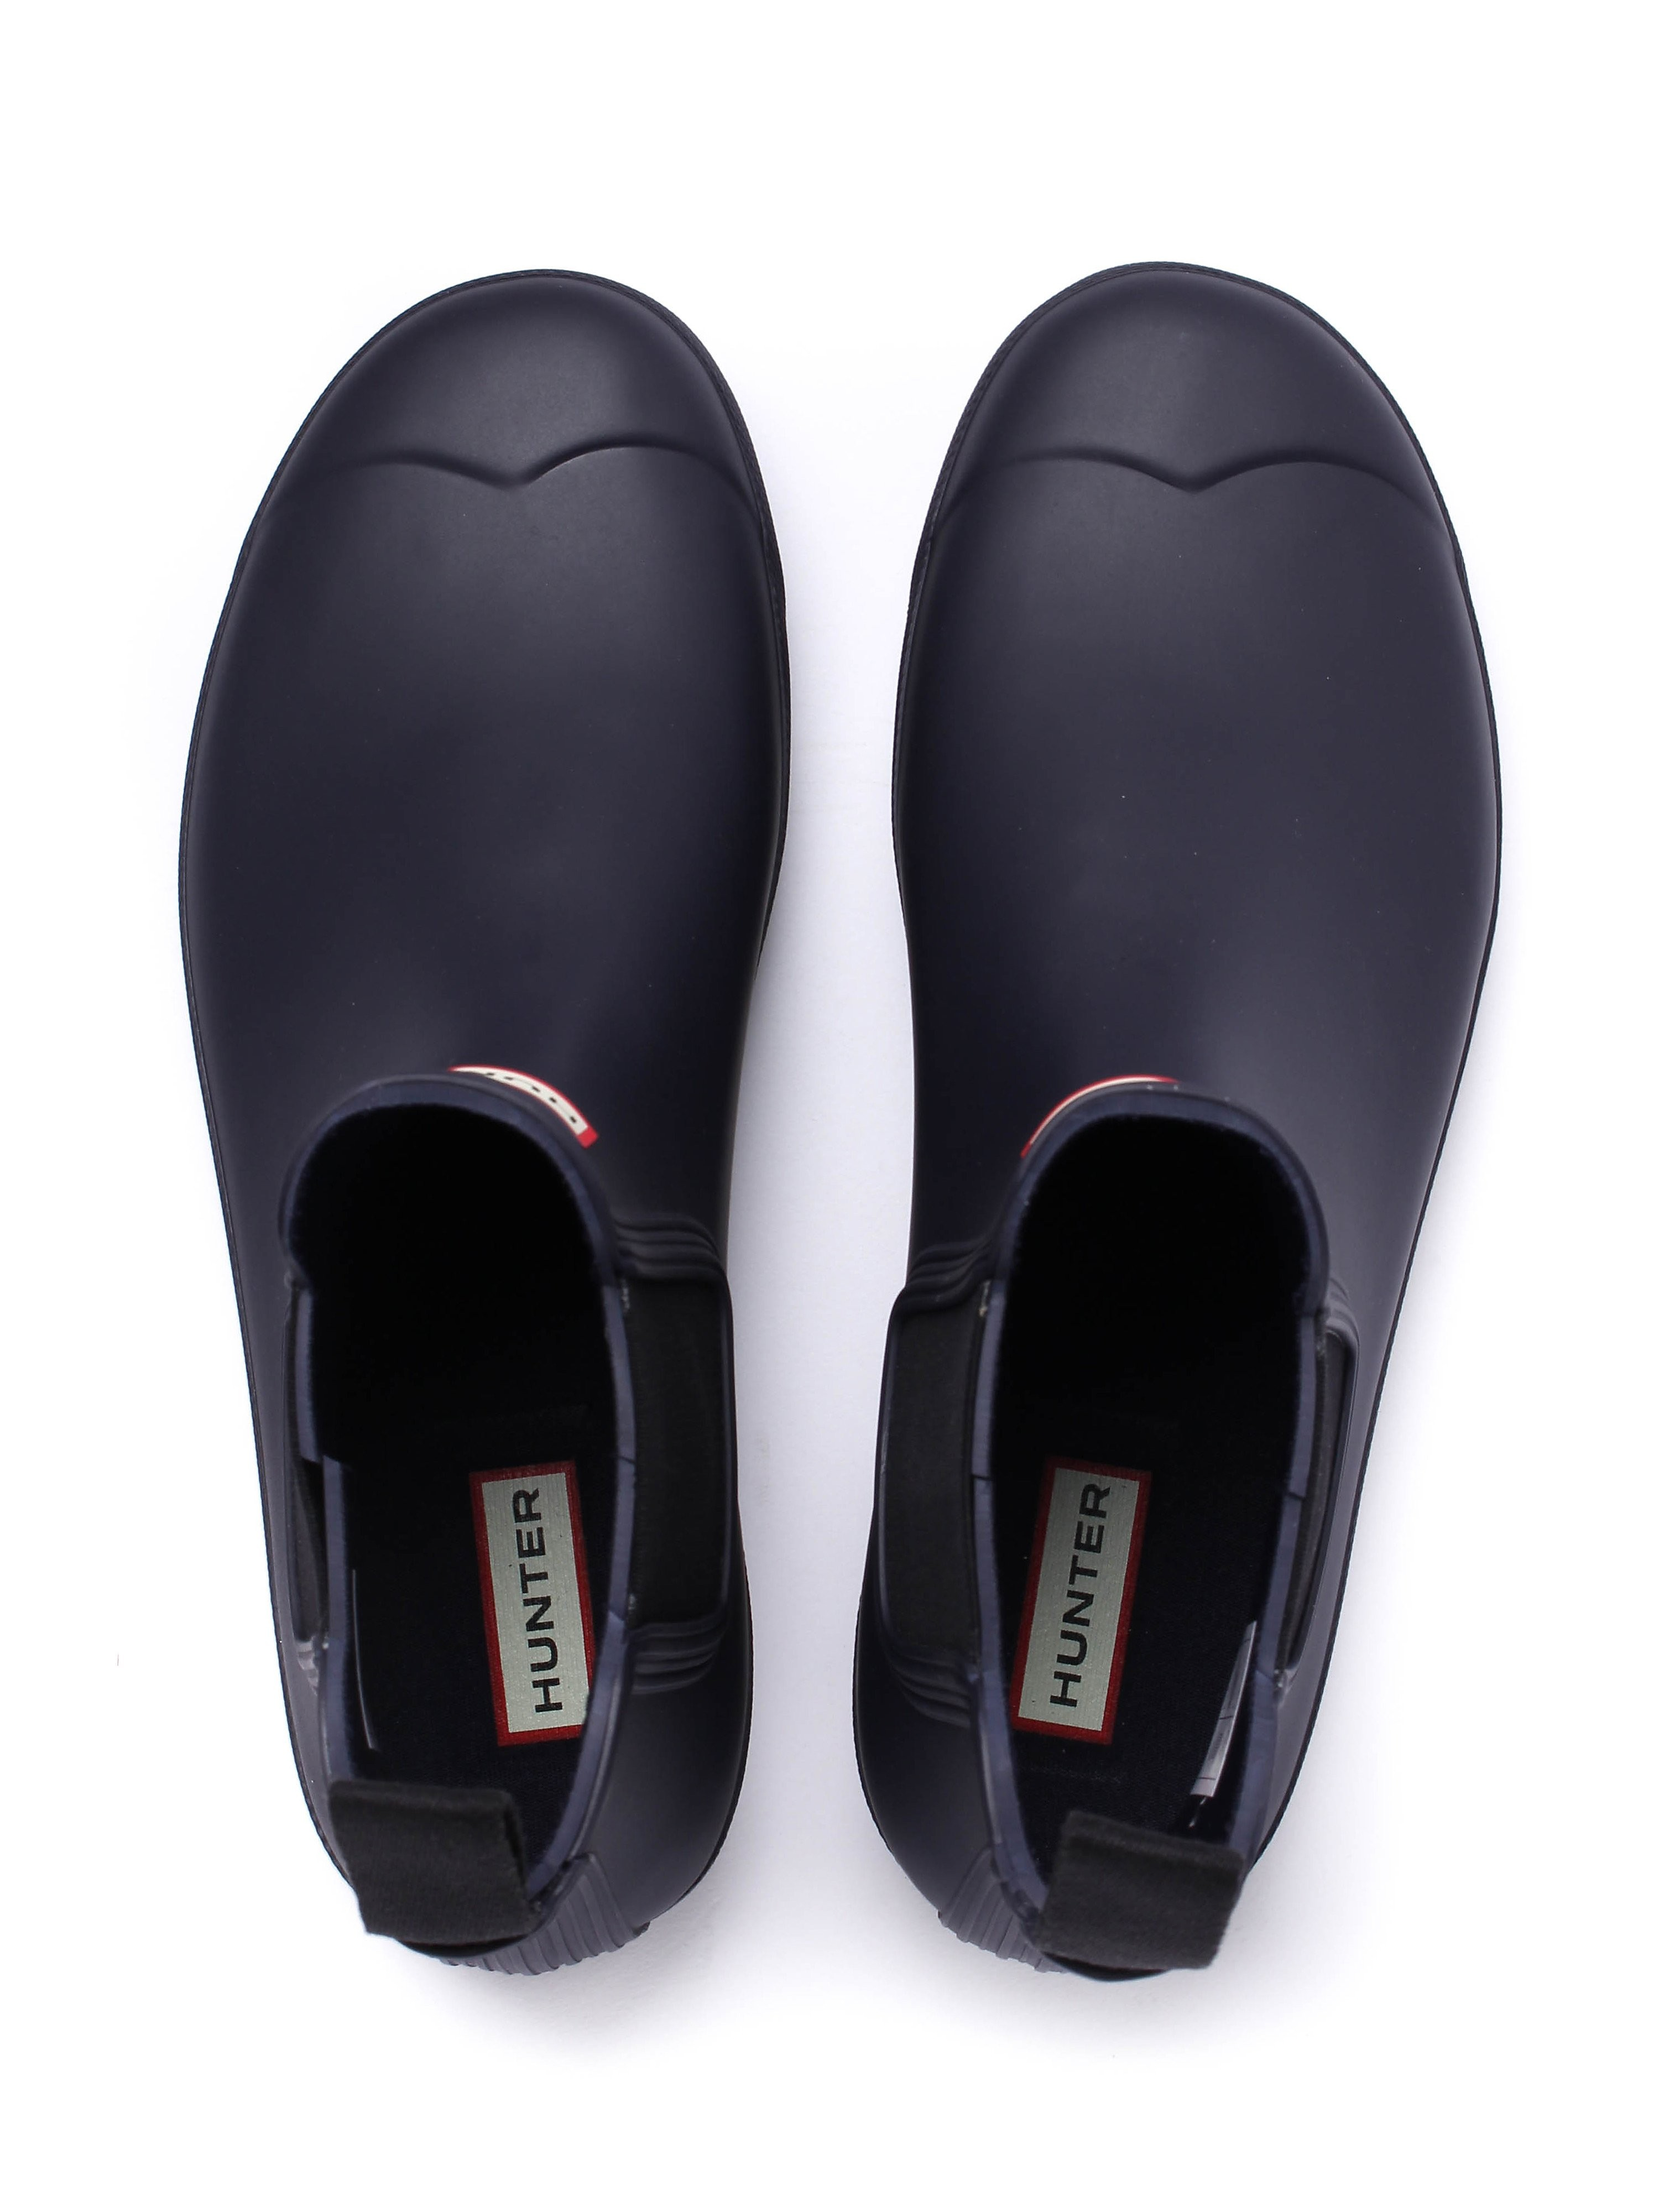 Hunter Wellies Original Dark Sole Chelsea Boots - Midnight